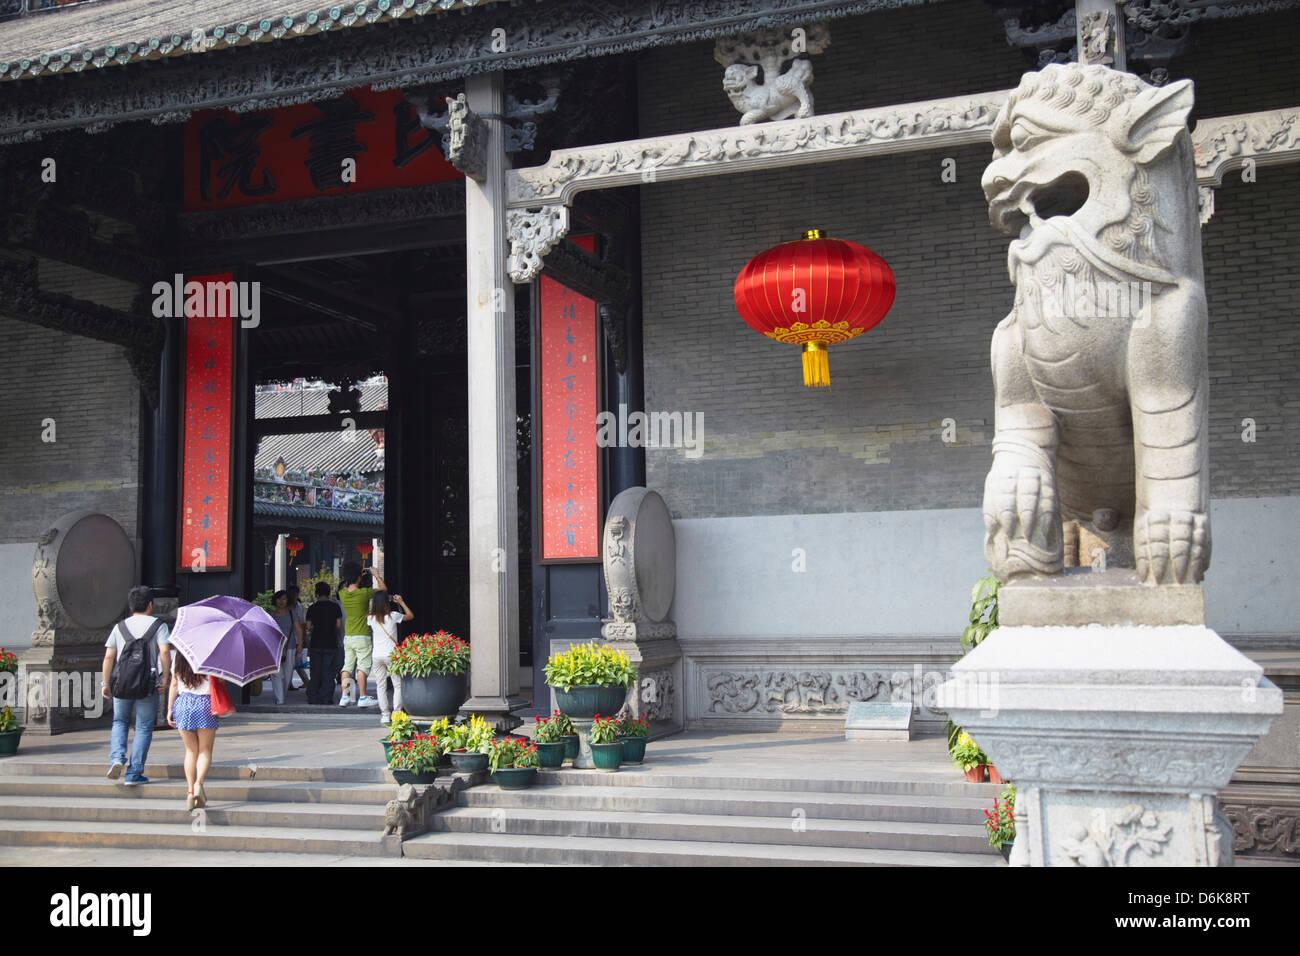 Menschen bei Chen Clan Akademie, Guangzhou, Guangdong, China, Asien Stockbild